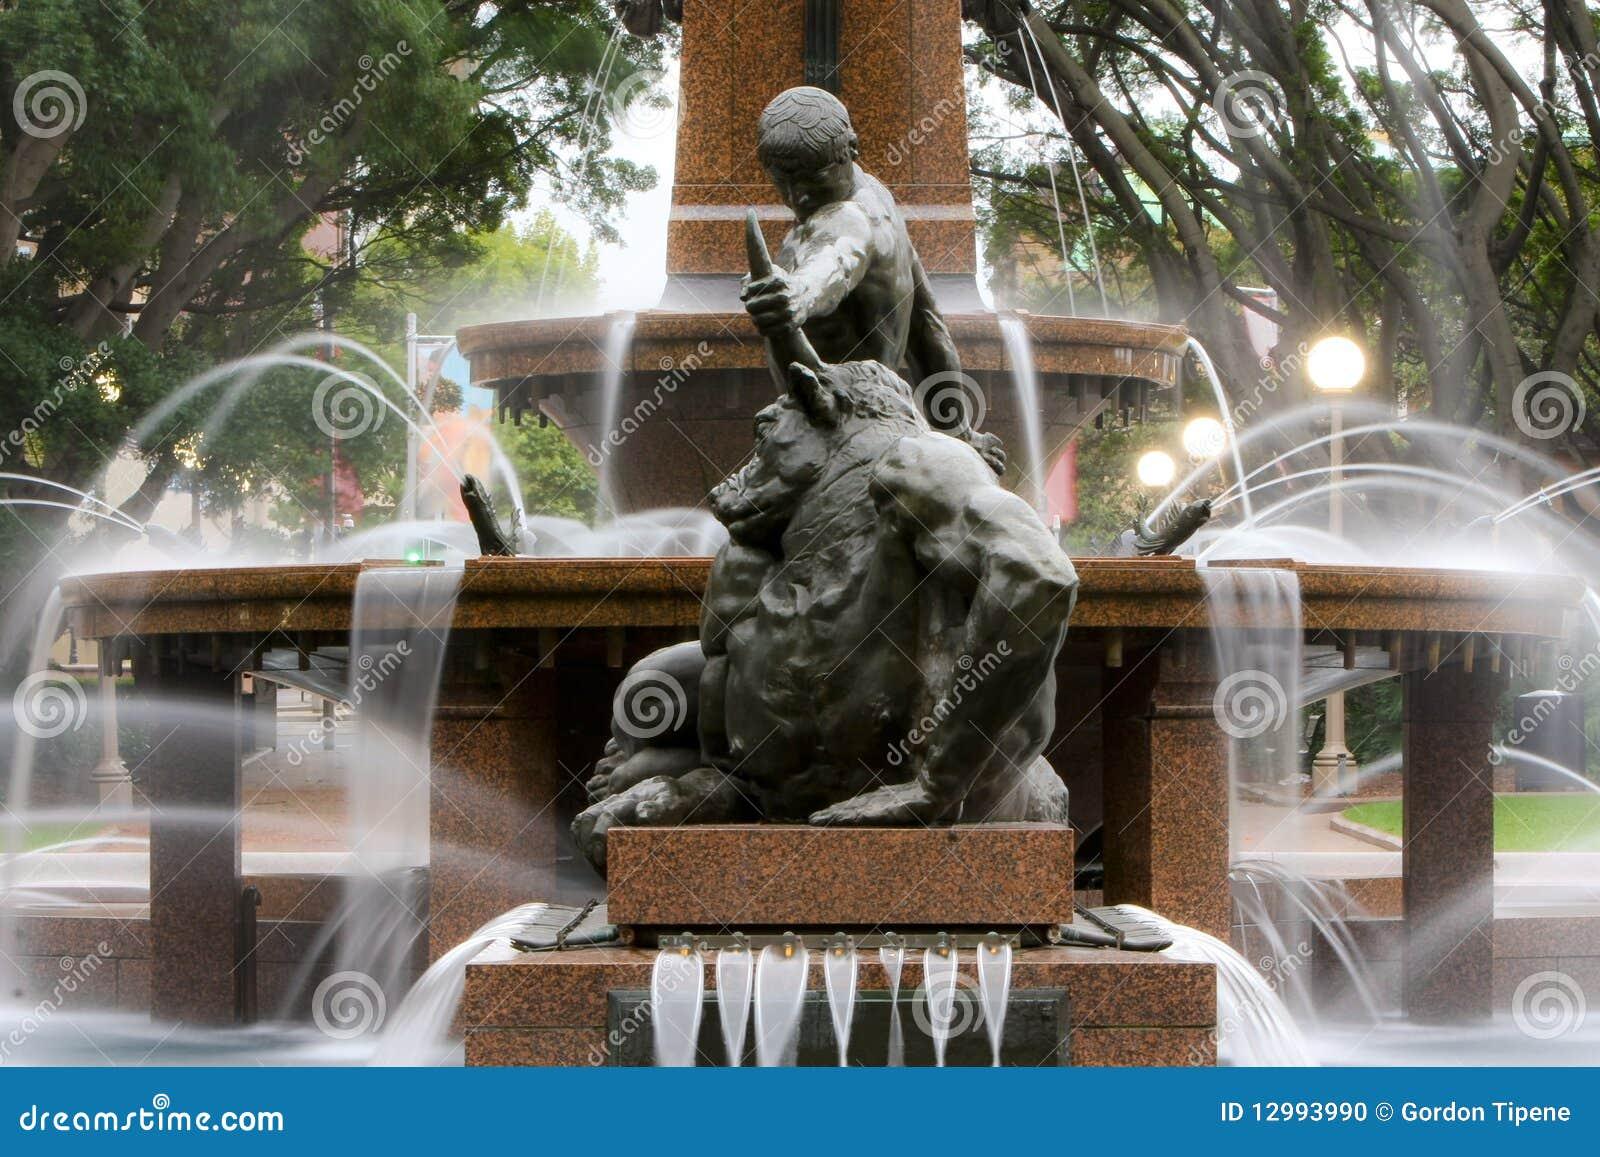 Water fountains hyde park - Water Fountain Hyde Park Sydney Australia Stock Photo